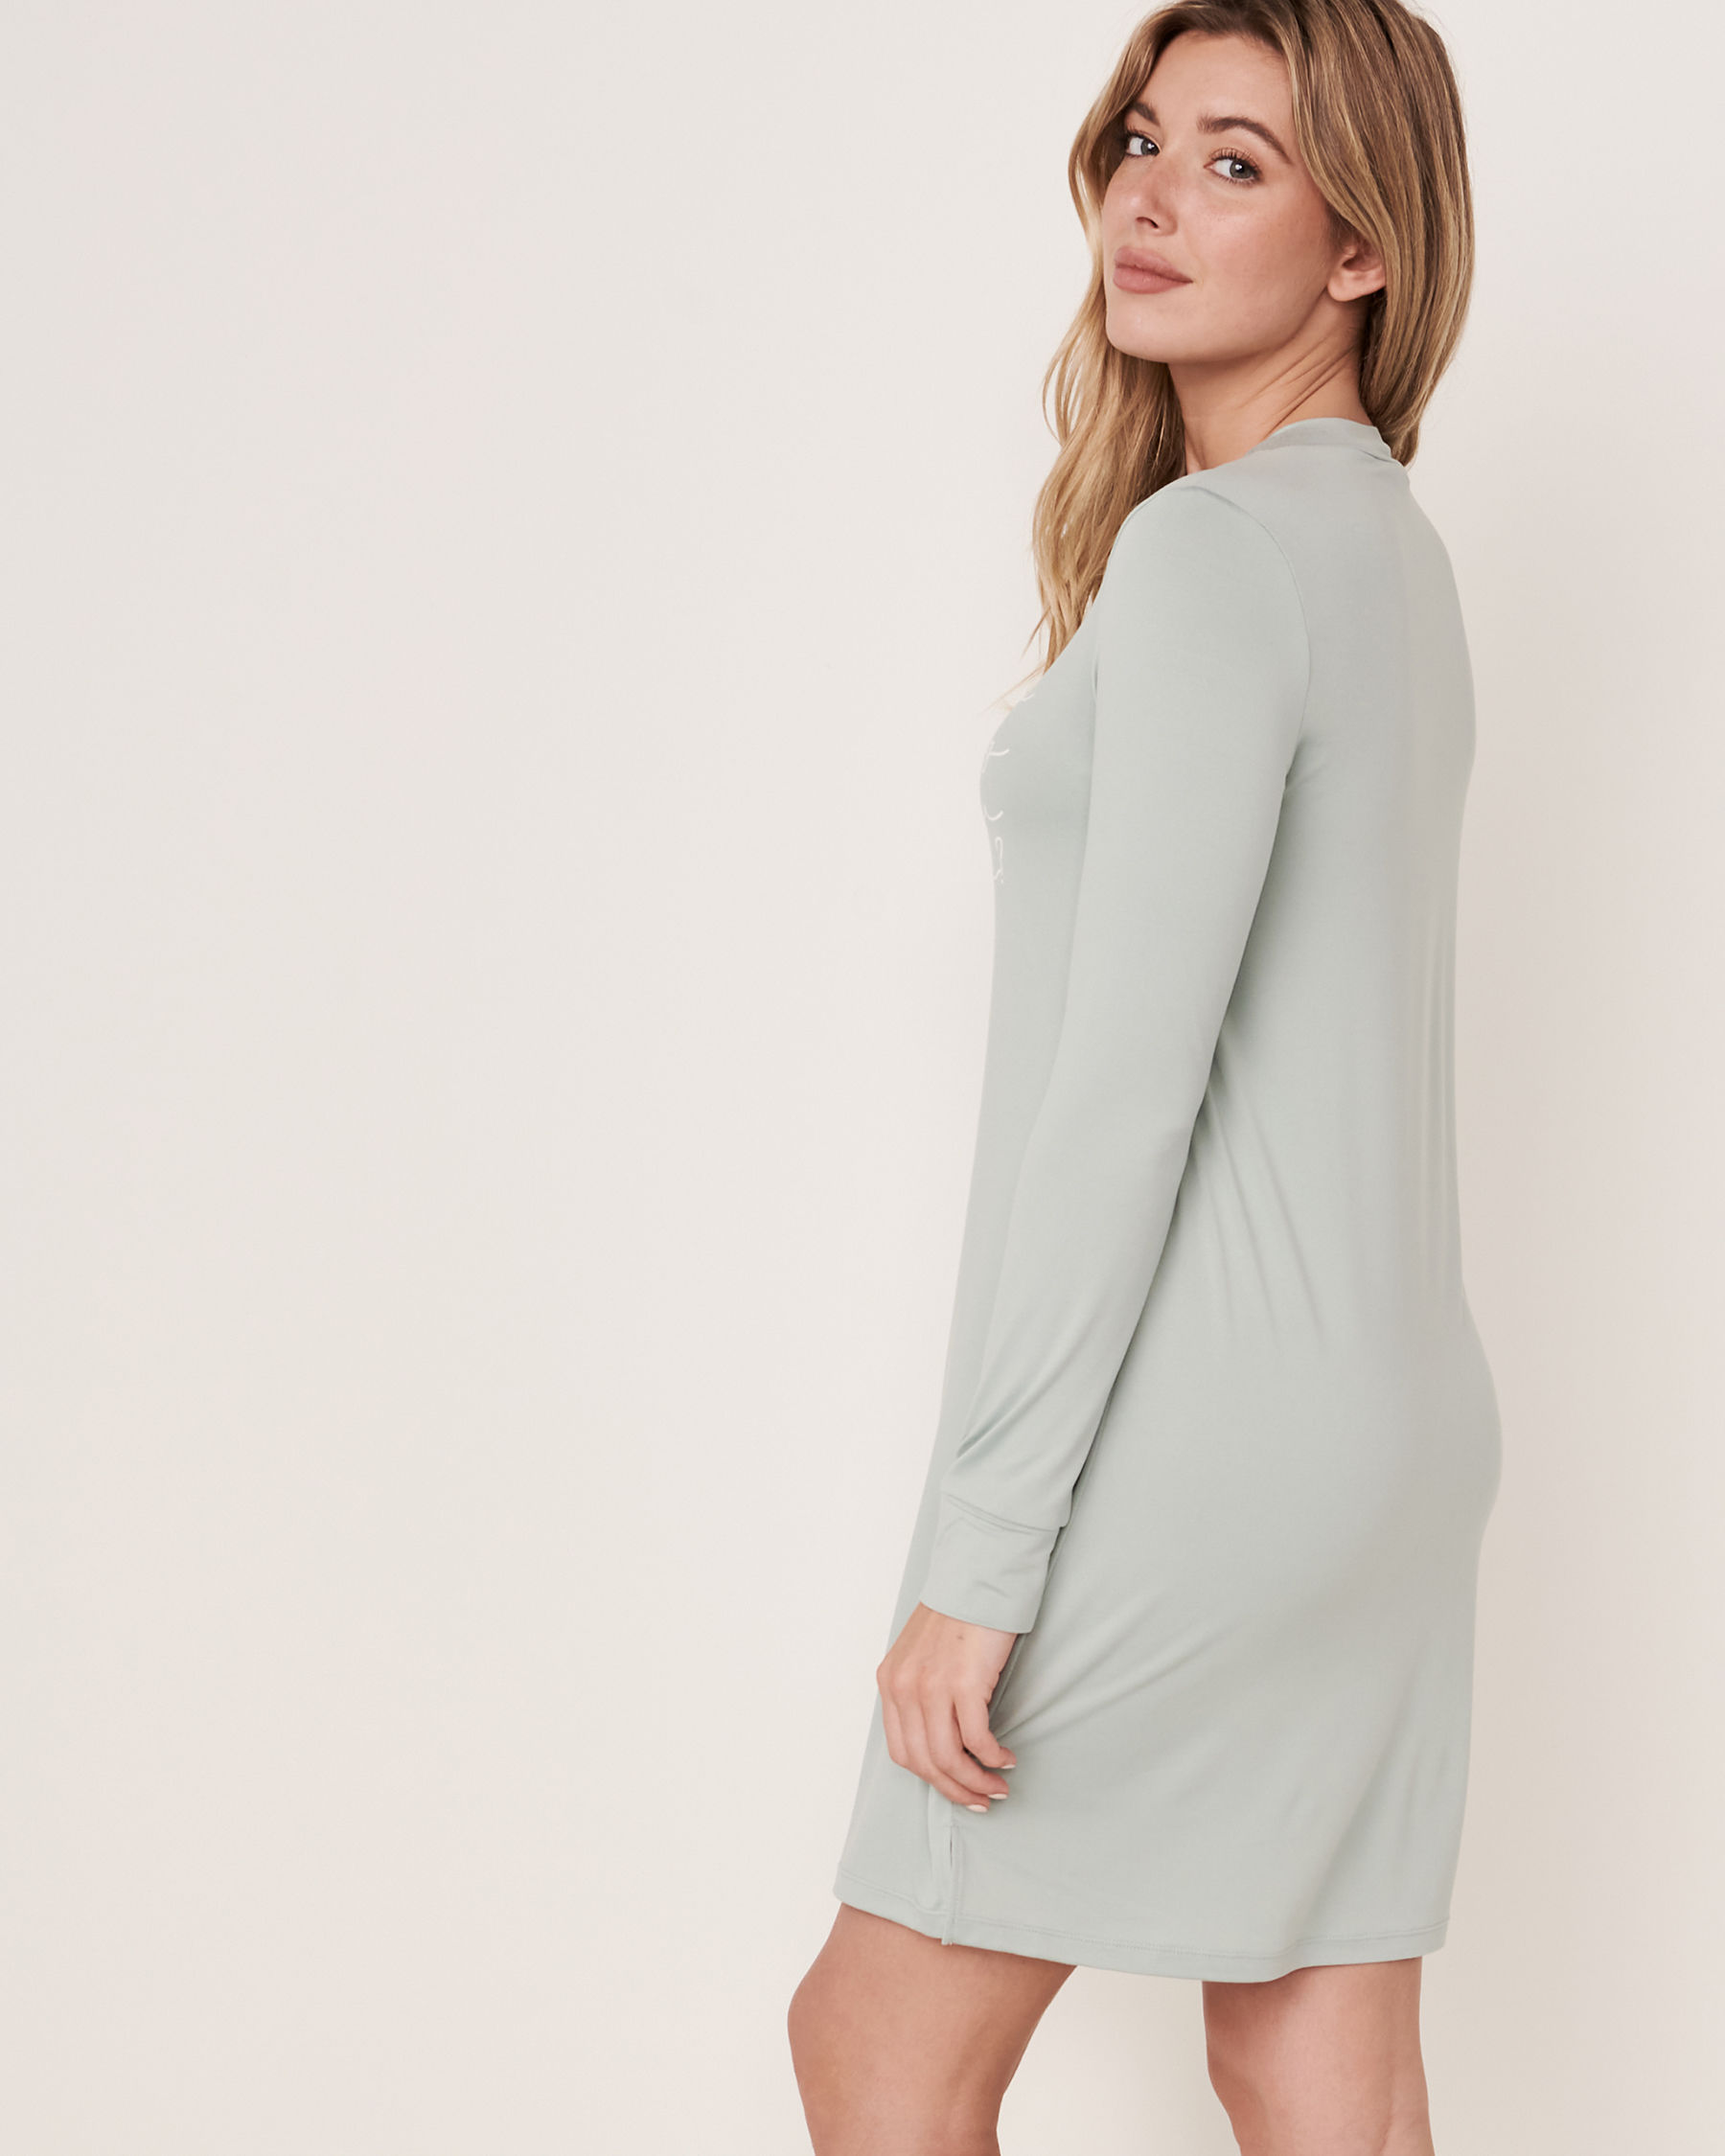 LA VIE EN ROSE High Neck Long Sleeve Sleepshirt Green 40500076 - View5